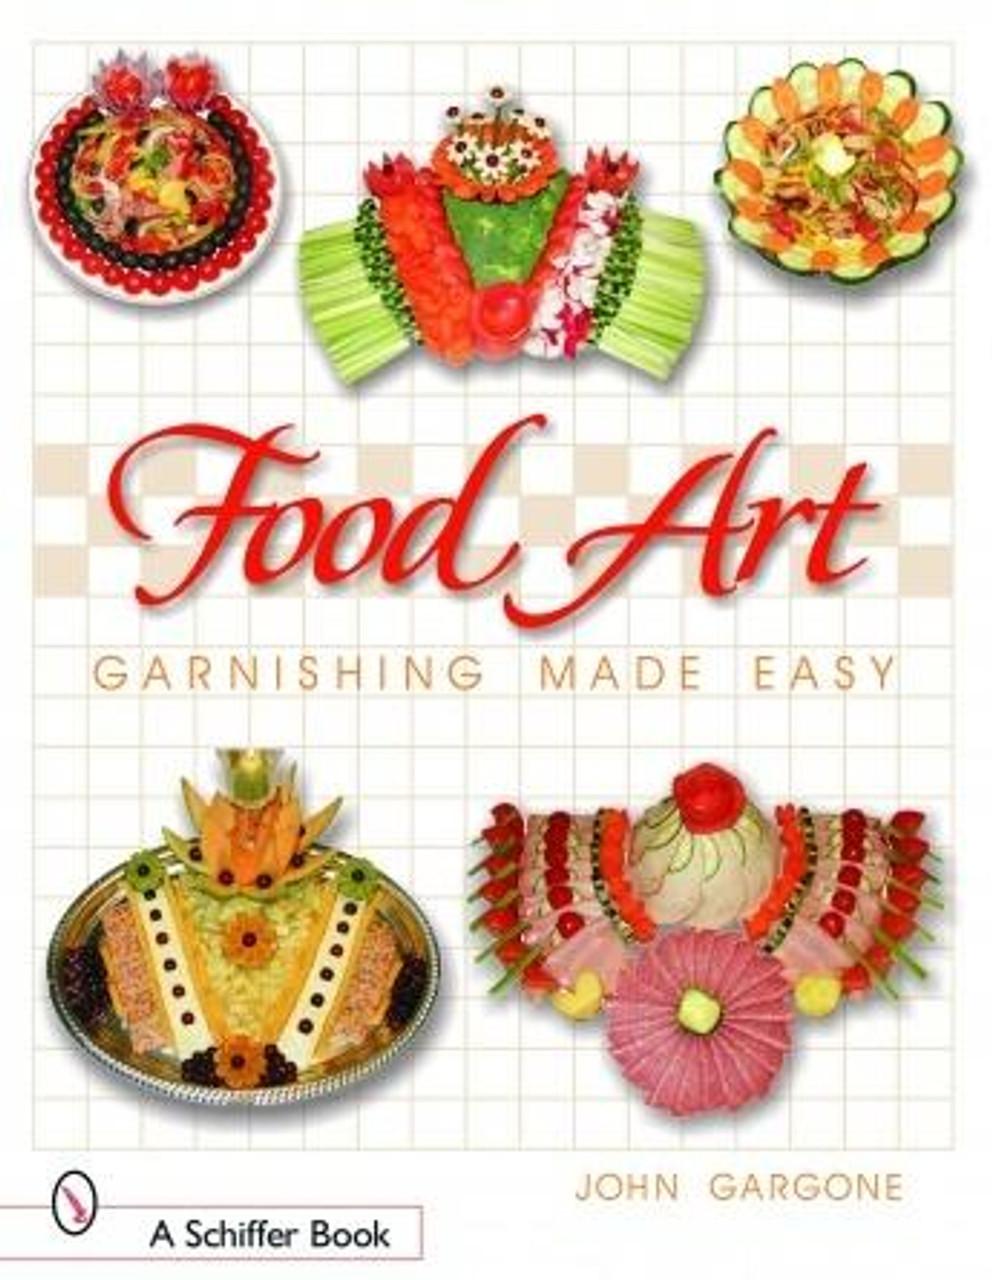 Schiffer Publishing Food Art Garnishing Made Easy